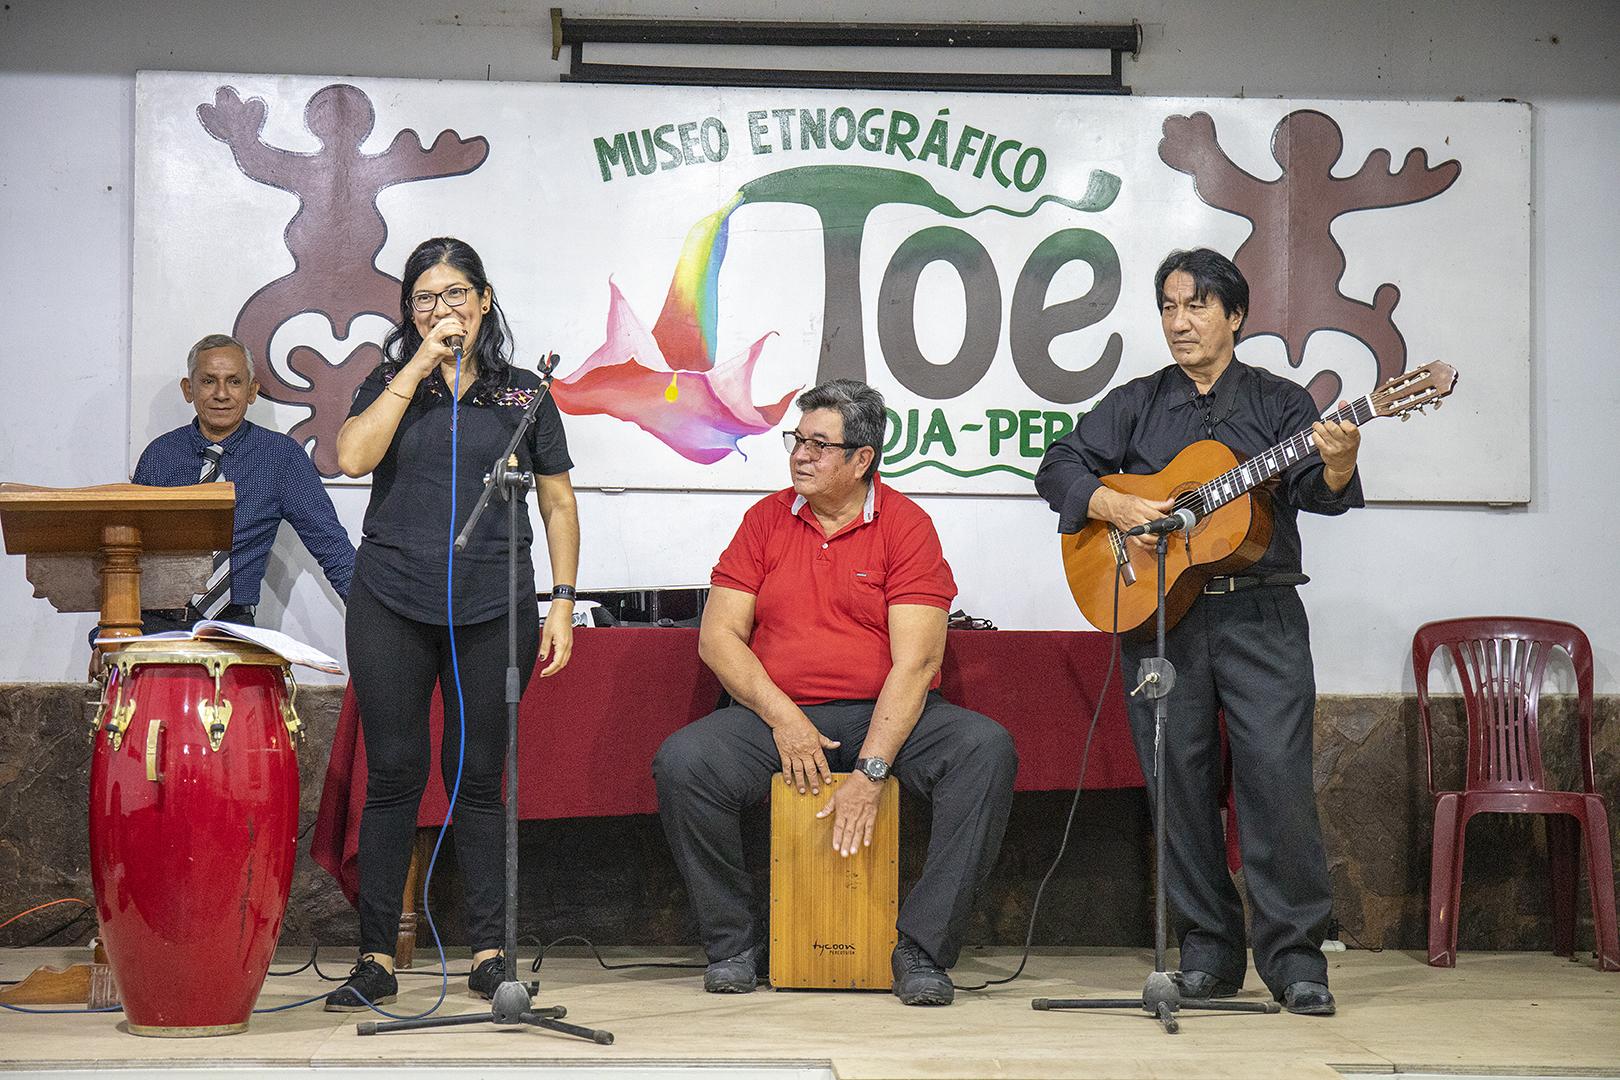 CON SHOW ARTÍSTICO I.E. SANTO TORIBIO DE RIOJA CELEBRÓ SU 74 ANIVERSARIO